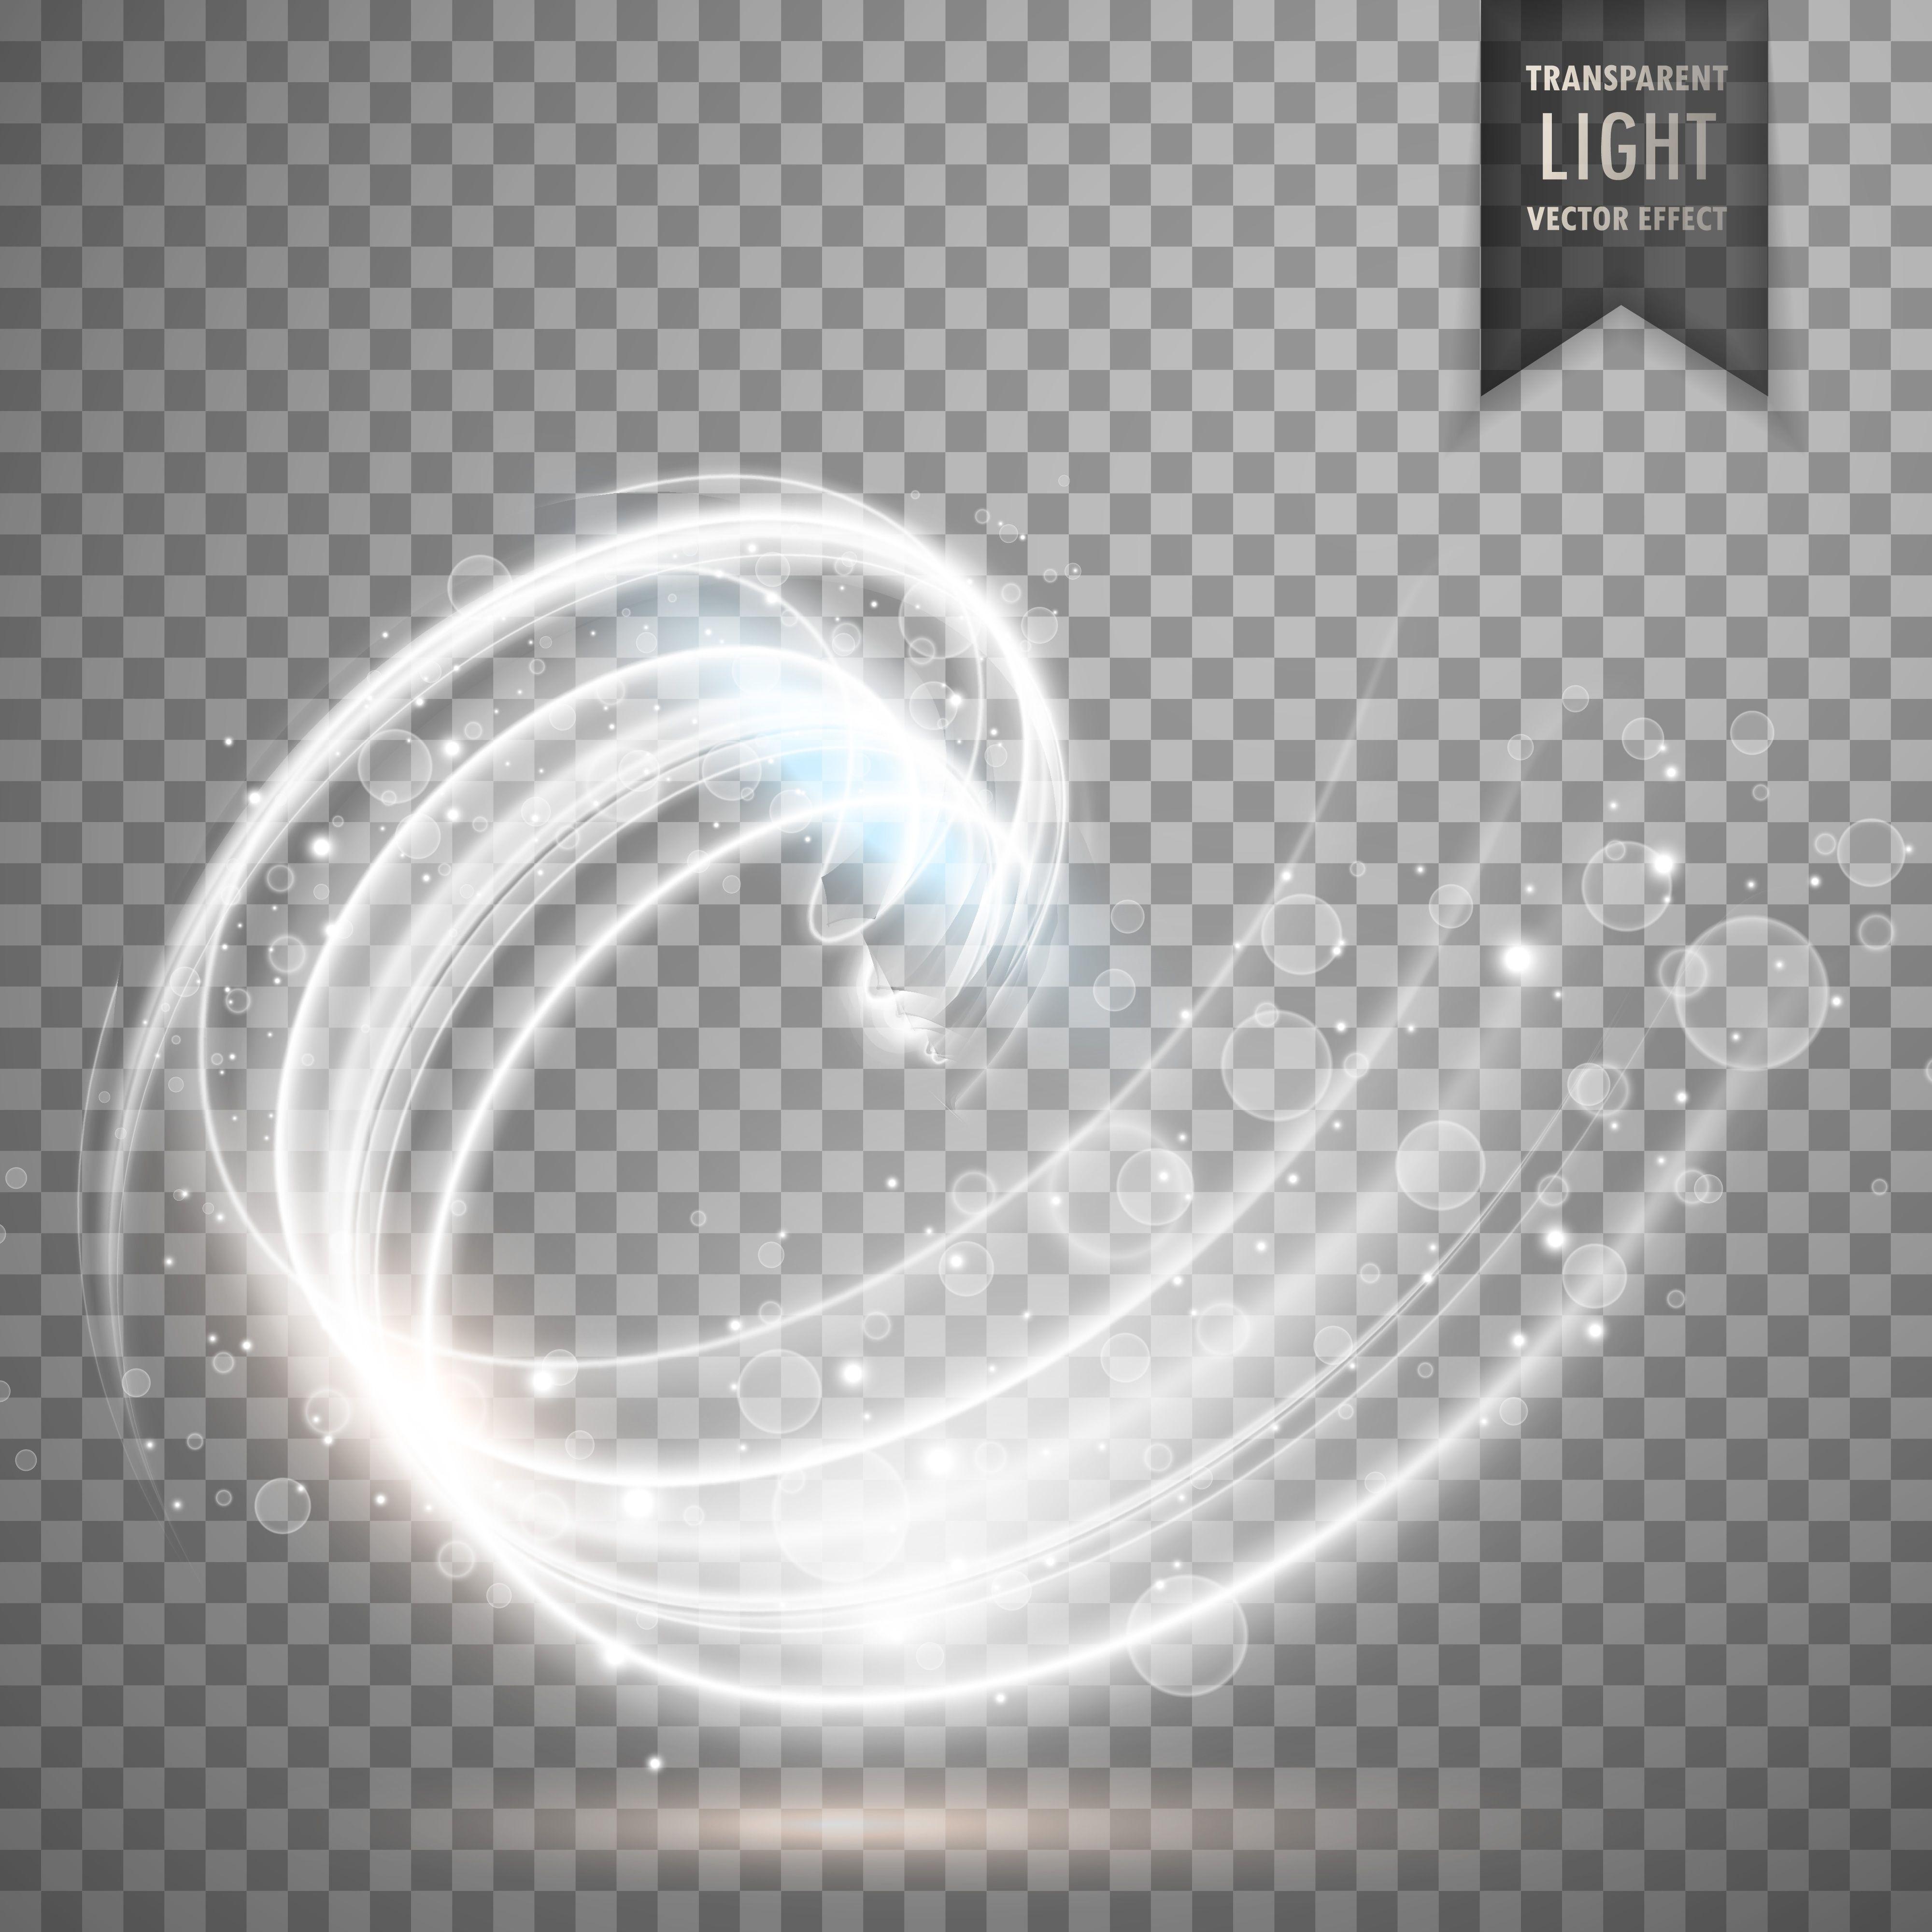 White Transparent Swirl Light Effect Background Vector Choose From Thousands Of Free Vectors Clip Art Designs Icons A Vector Art Design Vector Art Clip Art